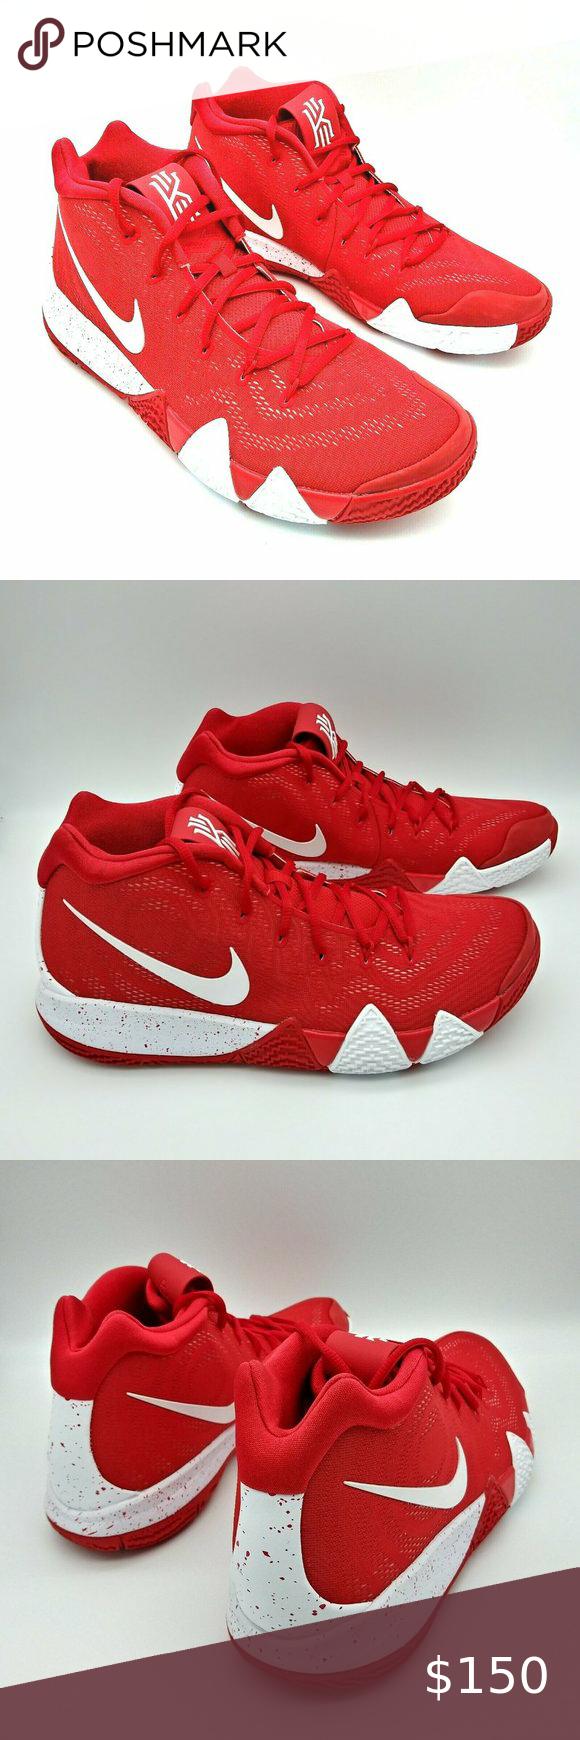 COPY - Nike Kyrie 4 TB Red White AV2296-600 Mens … Nike ...